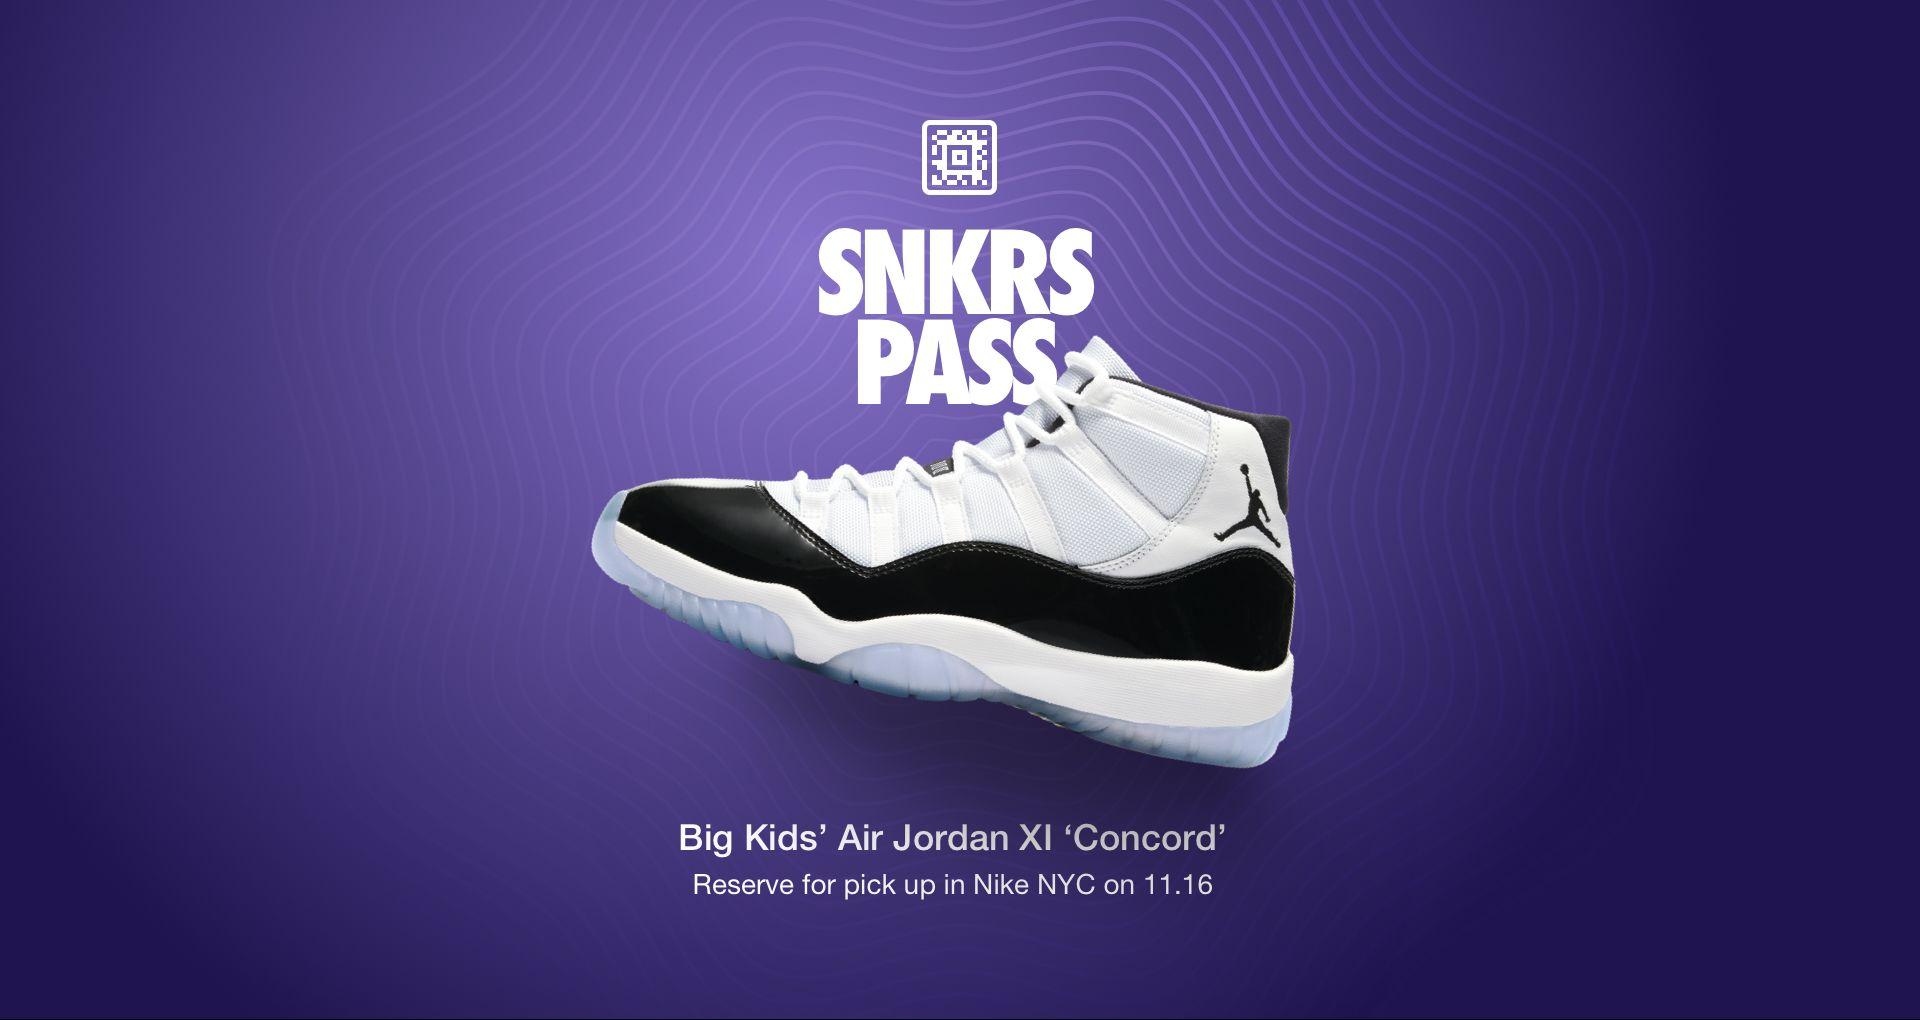 promo code 1d0cf 90dfc Big Kids' Air Jordan 11 'Concord' SNKRS Pass Nike NYC. Nike ...